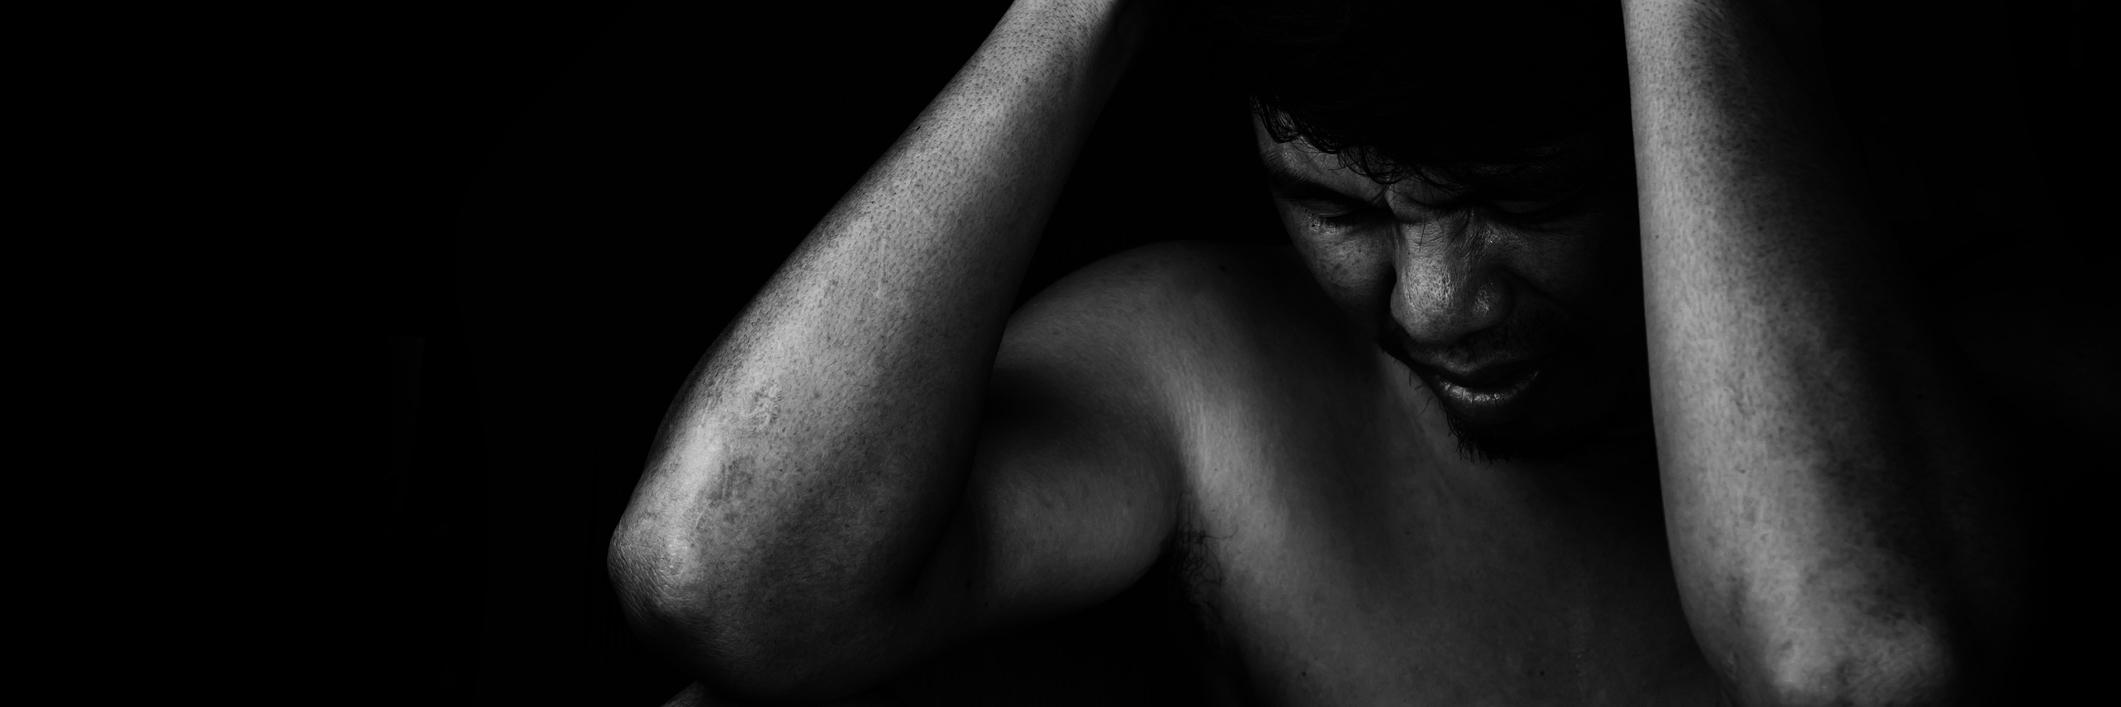 man in darkness looking depressed